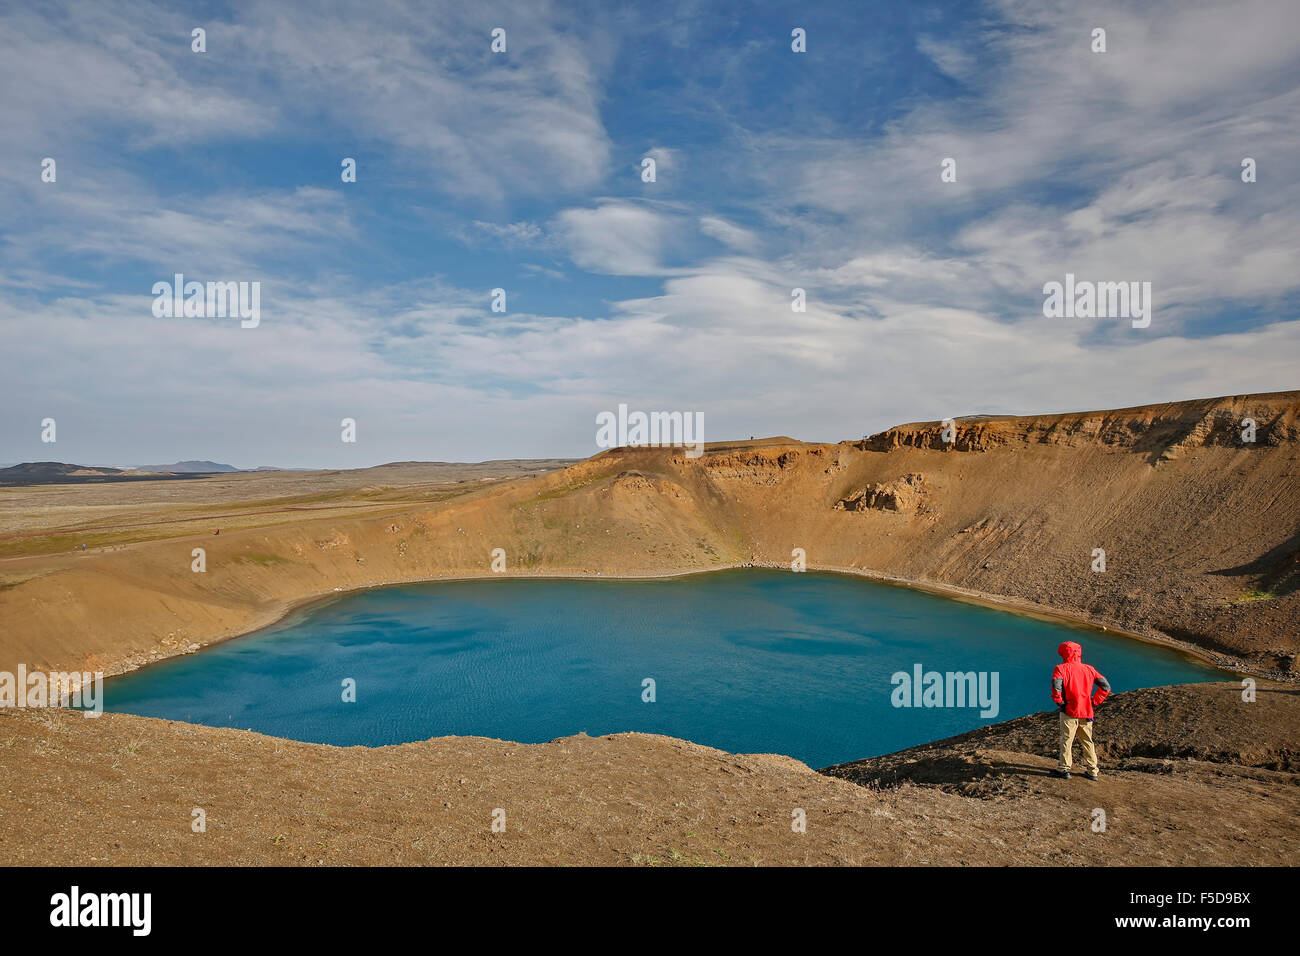 Hiker admiring explosion crater Viti, Krafla Volcano, near Reykjahlid, Iceland - Stock Image